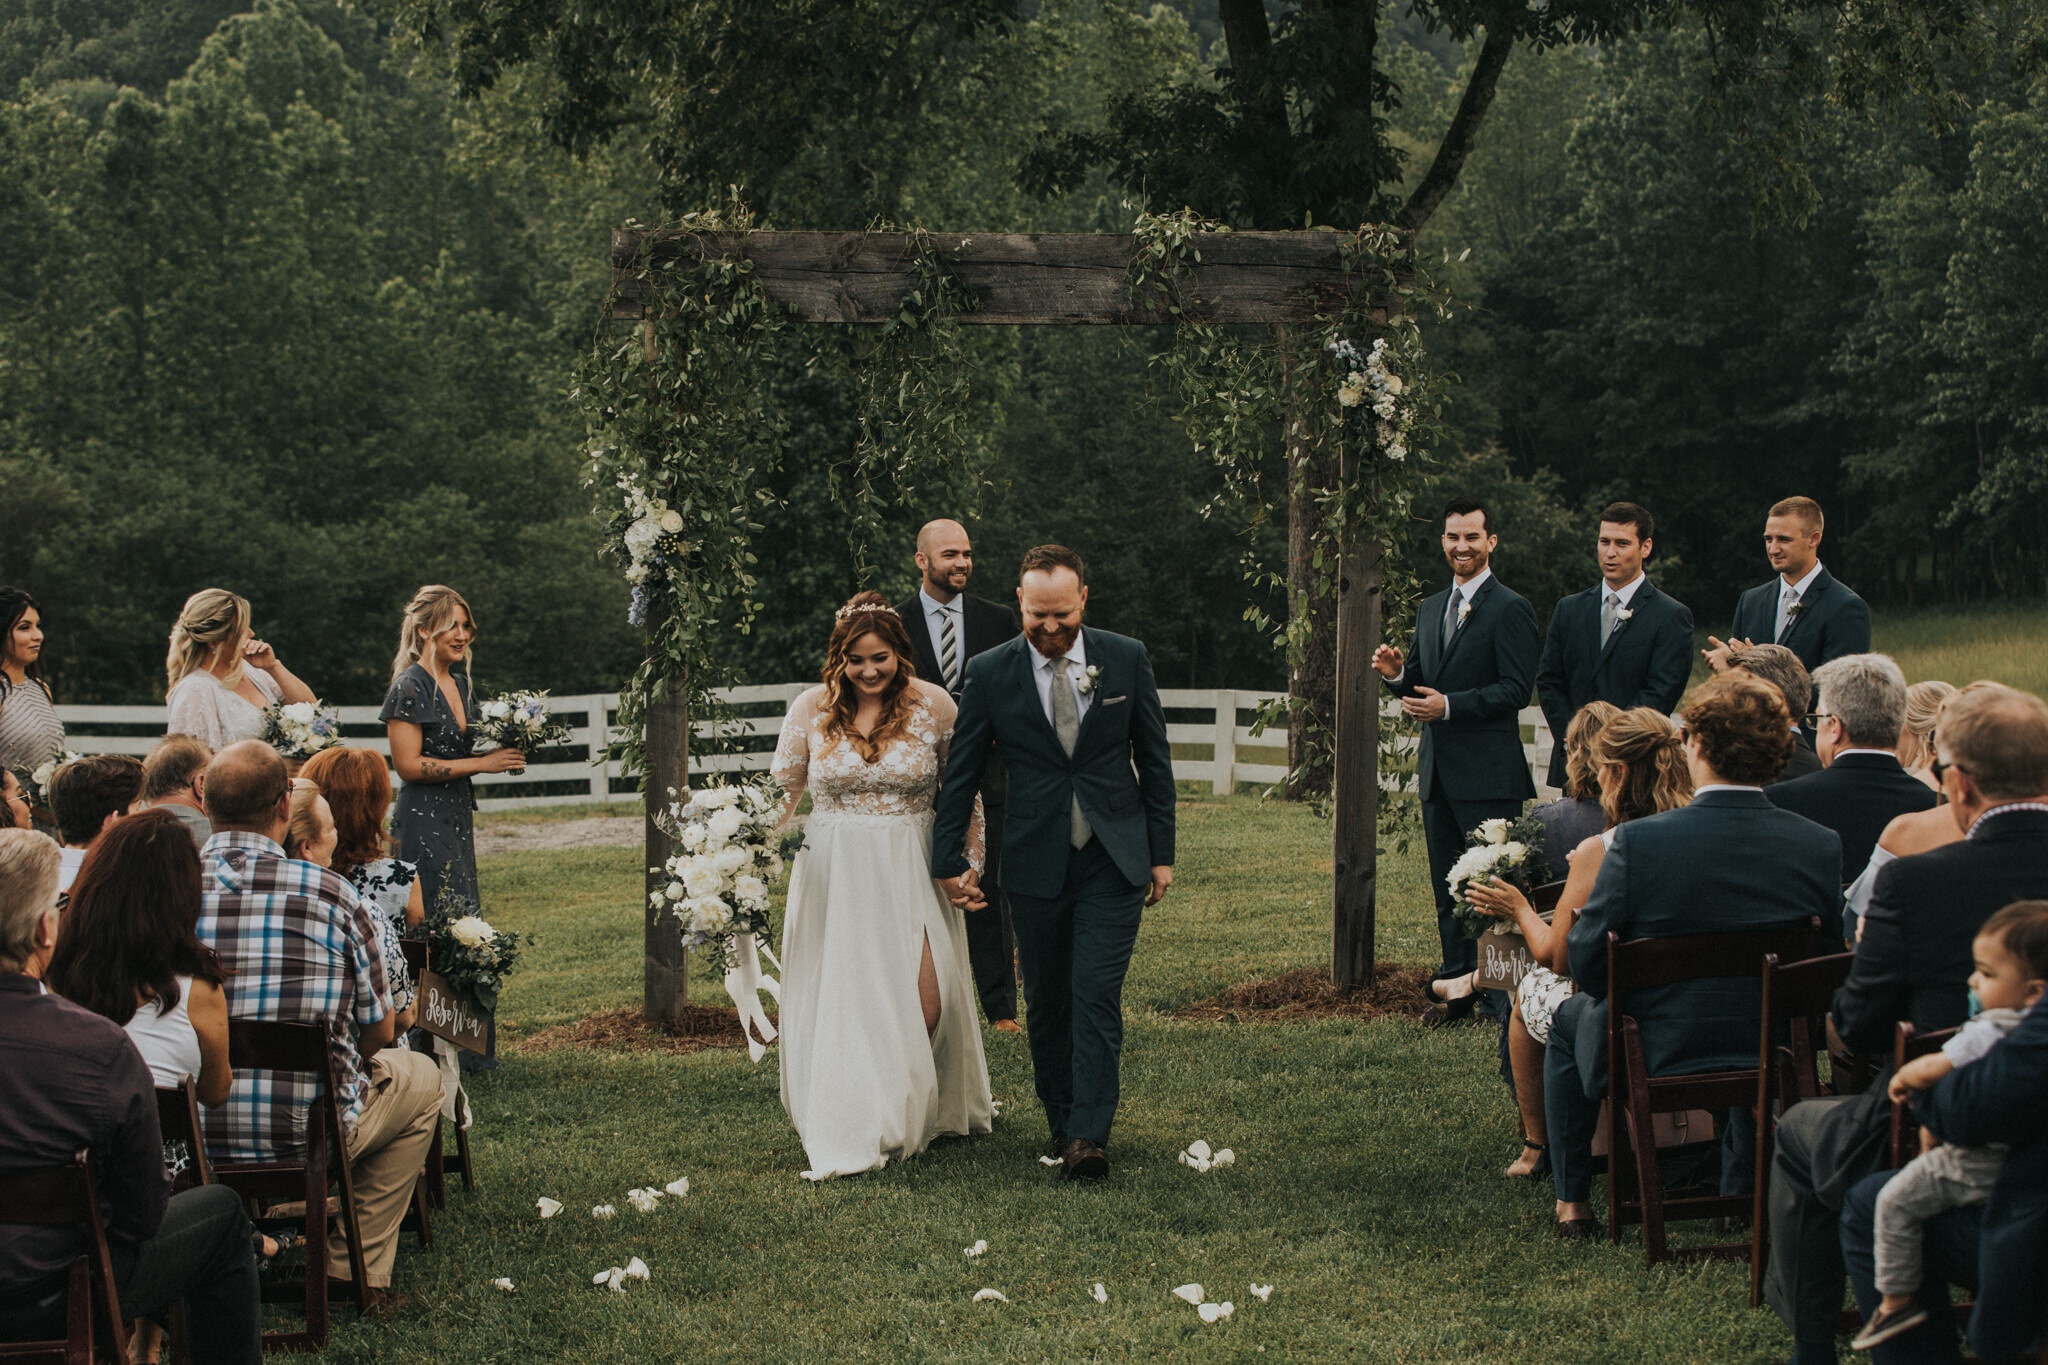 KateMatt-North-Georgia-Wedding-Photographer-Mountain-Laurel-Farm-113.jpg